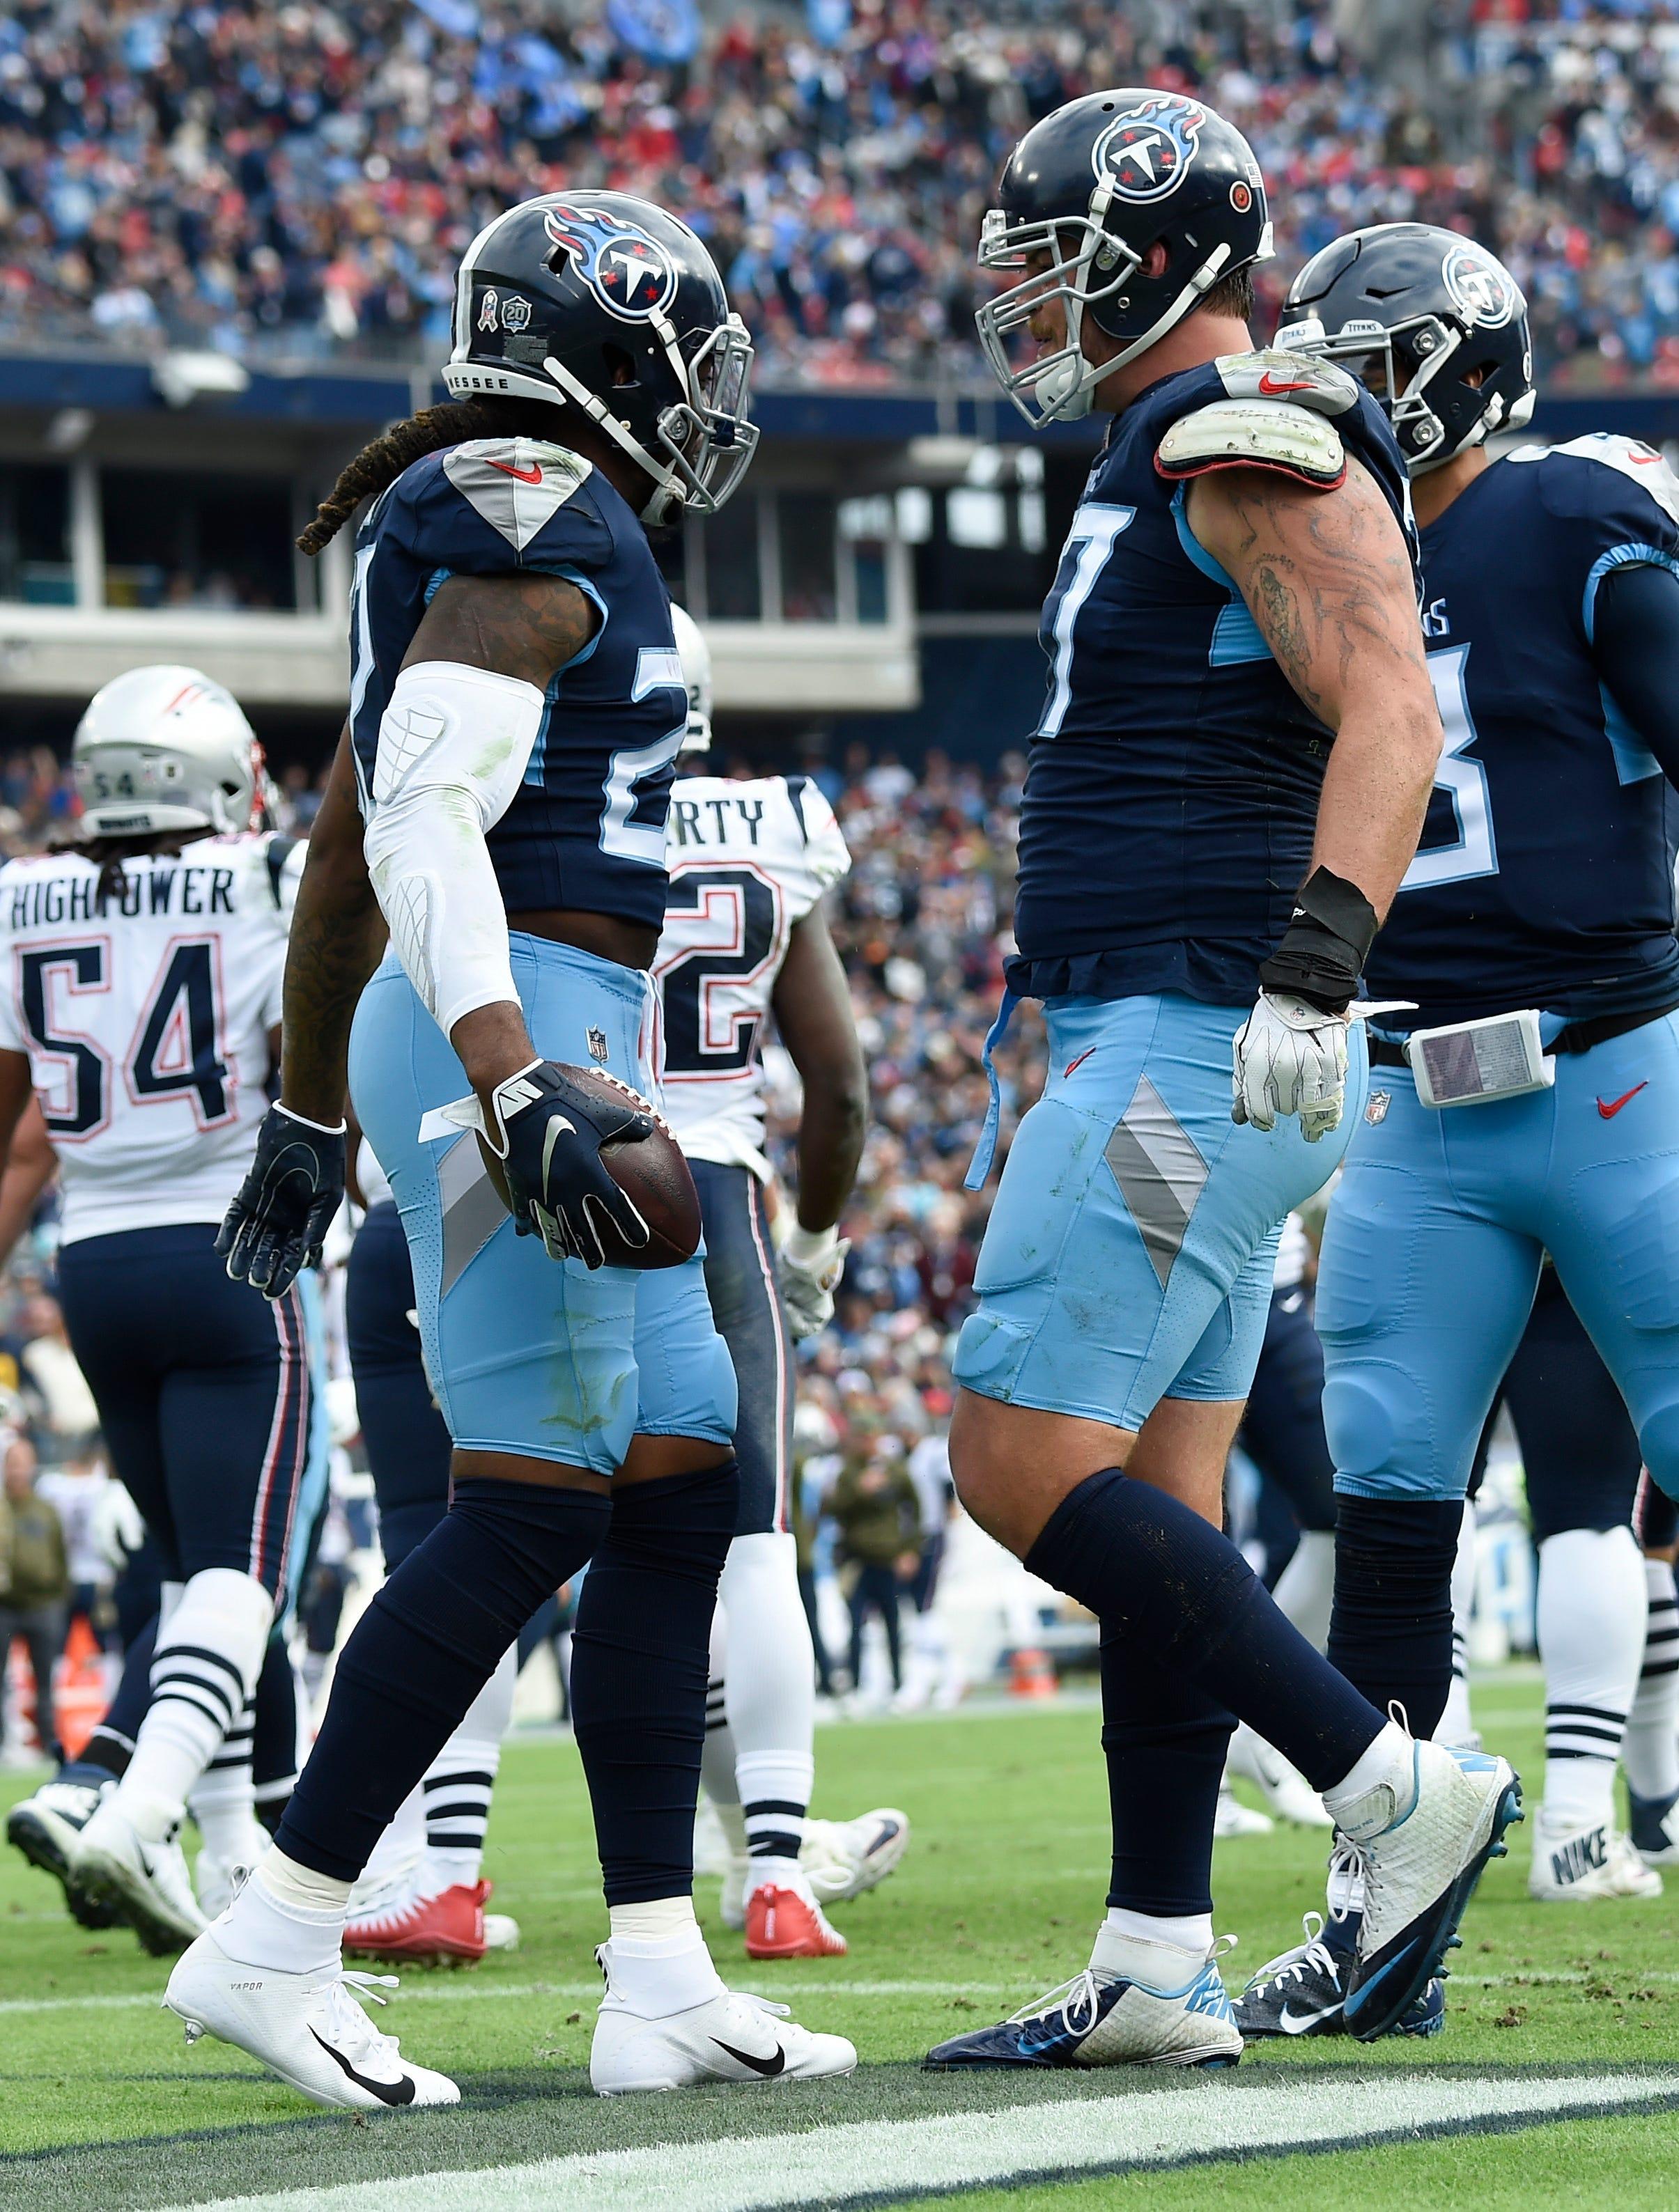 Titans score convincing win against Tom Brady, Patriots